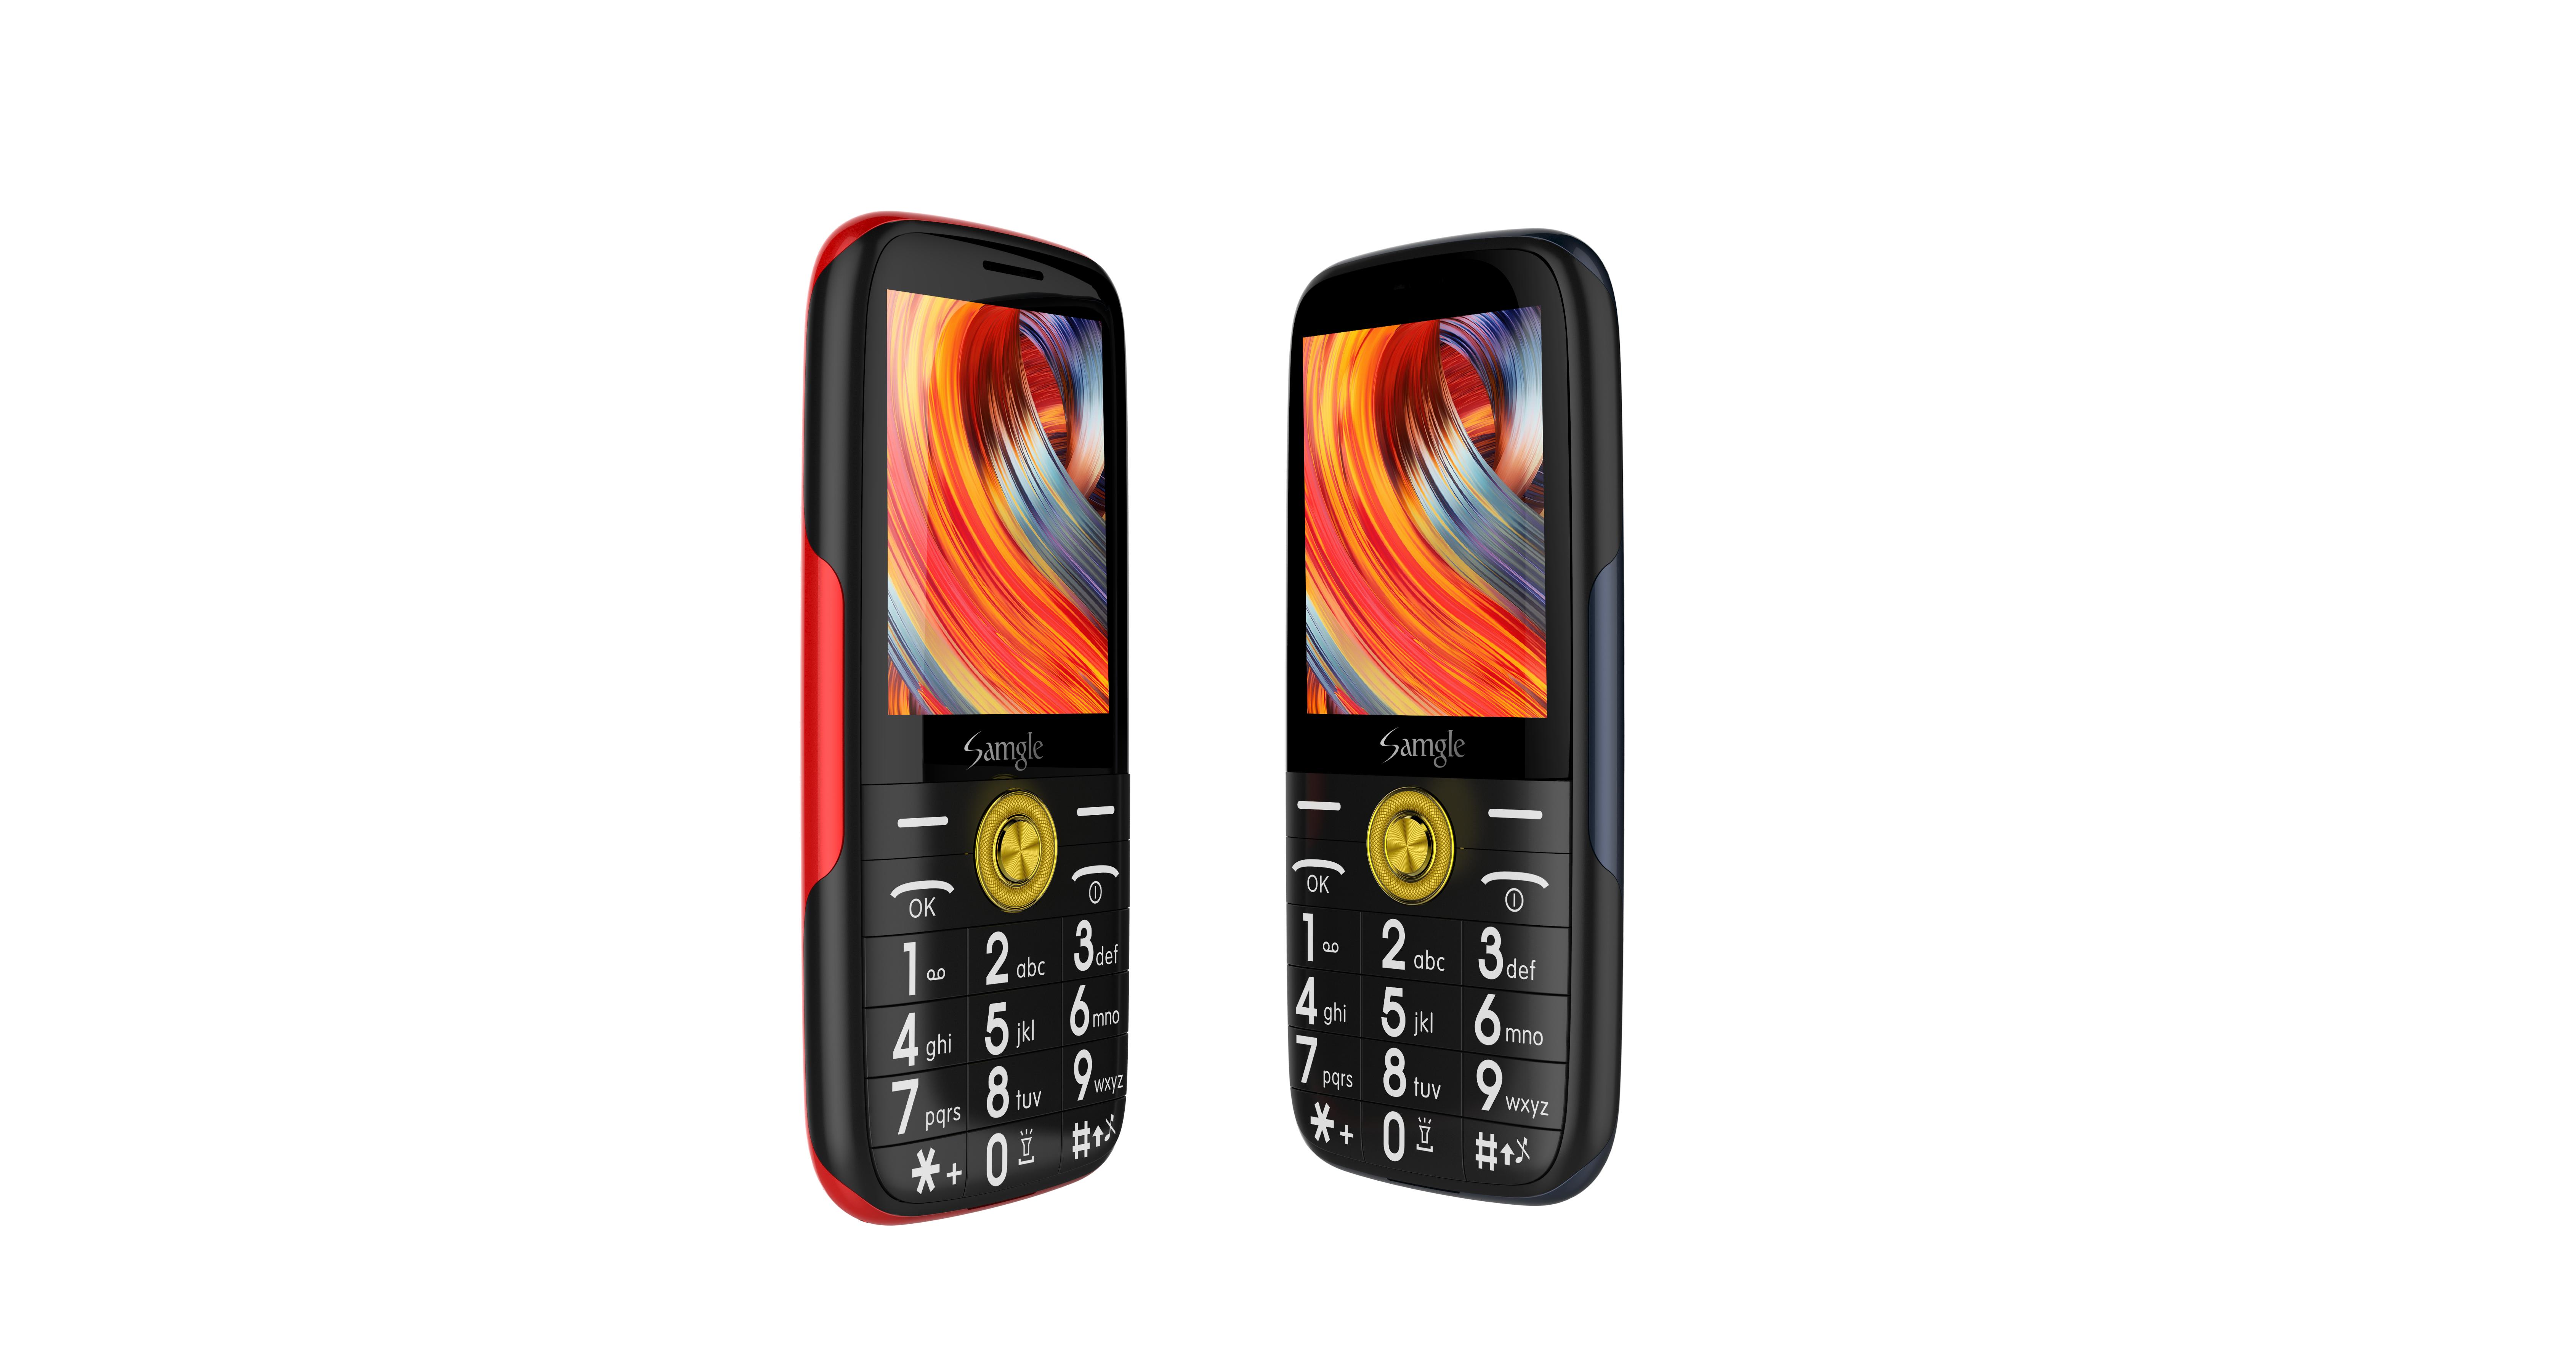 Telefon mobil Samgle Captain 3G, QVGA 2.4 inch, Bluetooth, Digi 3G, Camera, Slot Card, Radio FM, Internet, Dual SIM 22